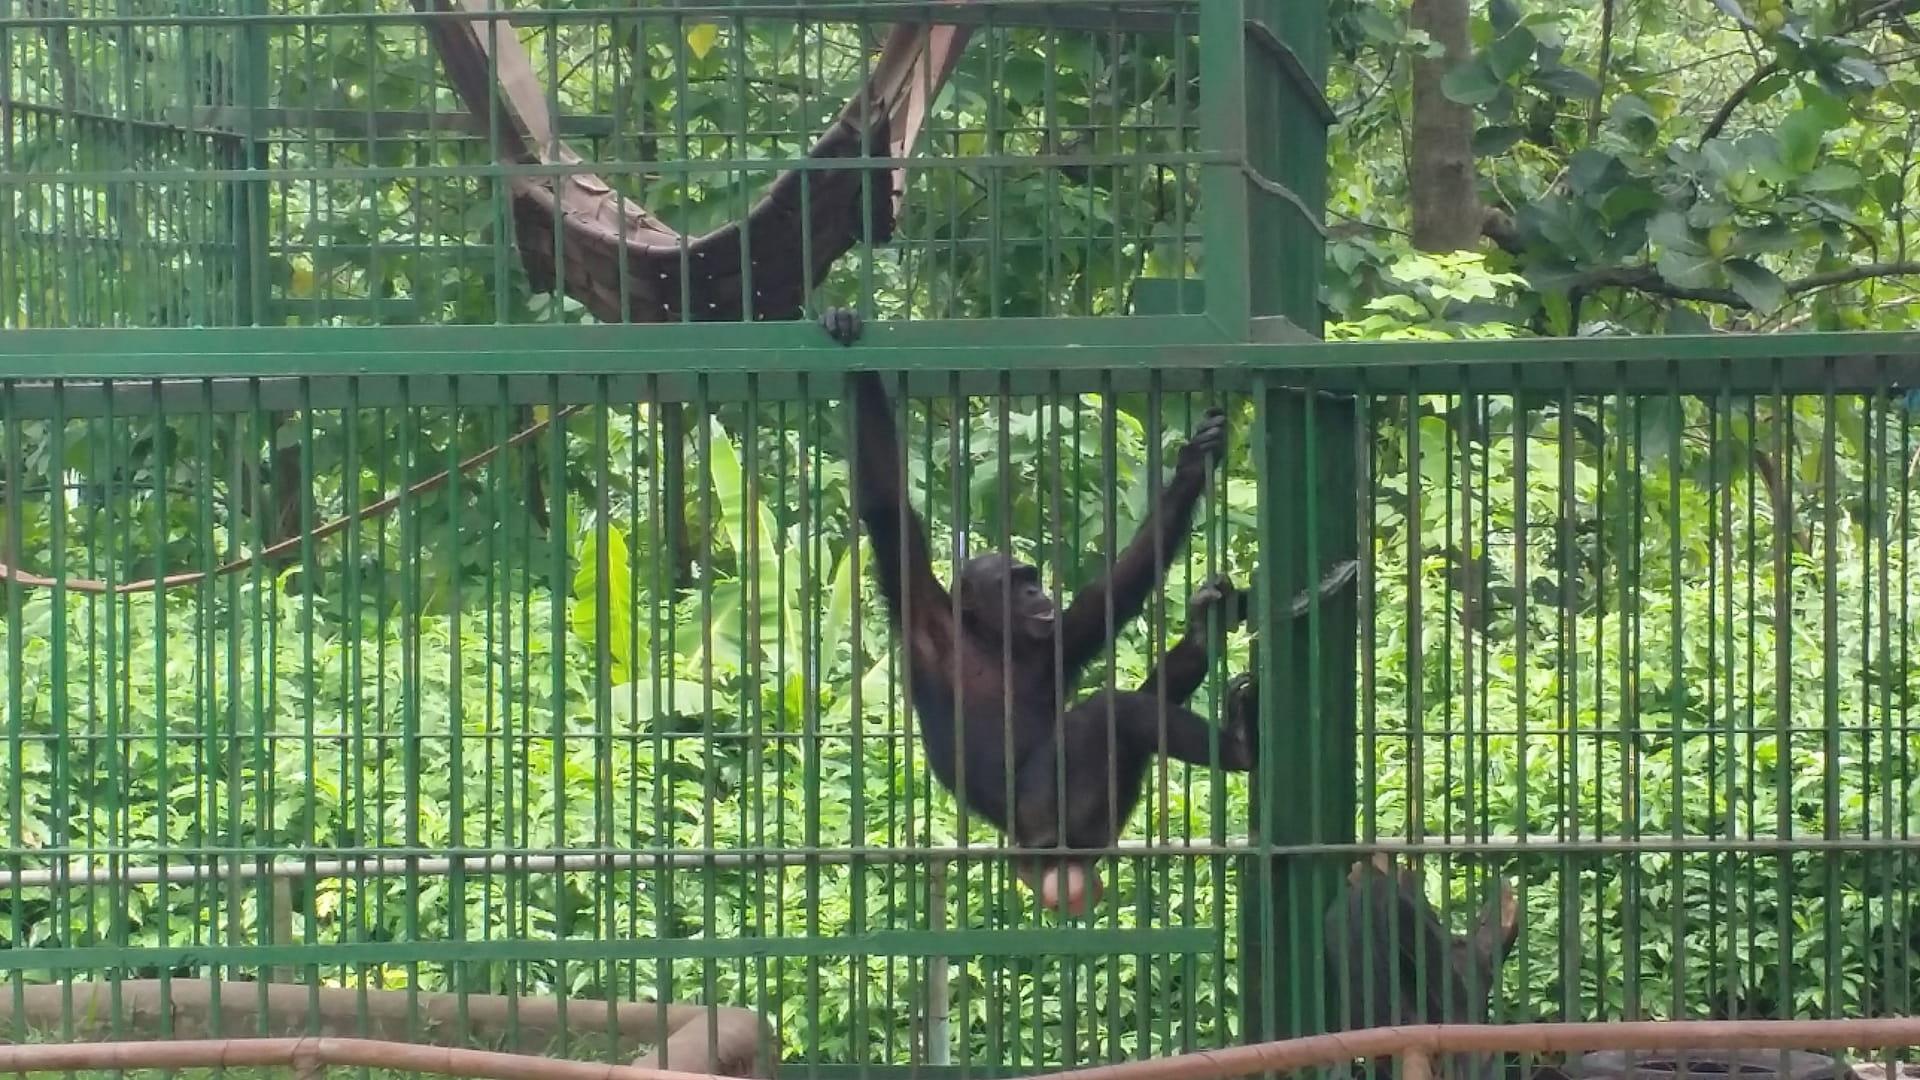 Male Chimp at Kumasi Zoo